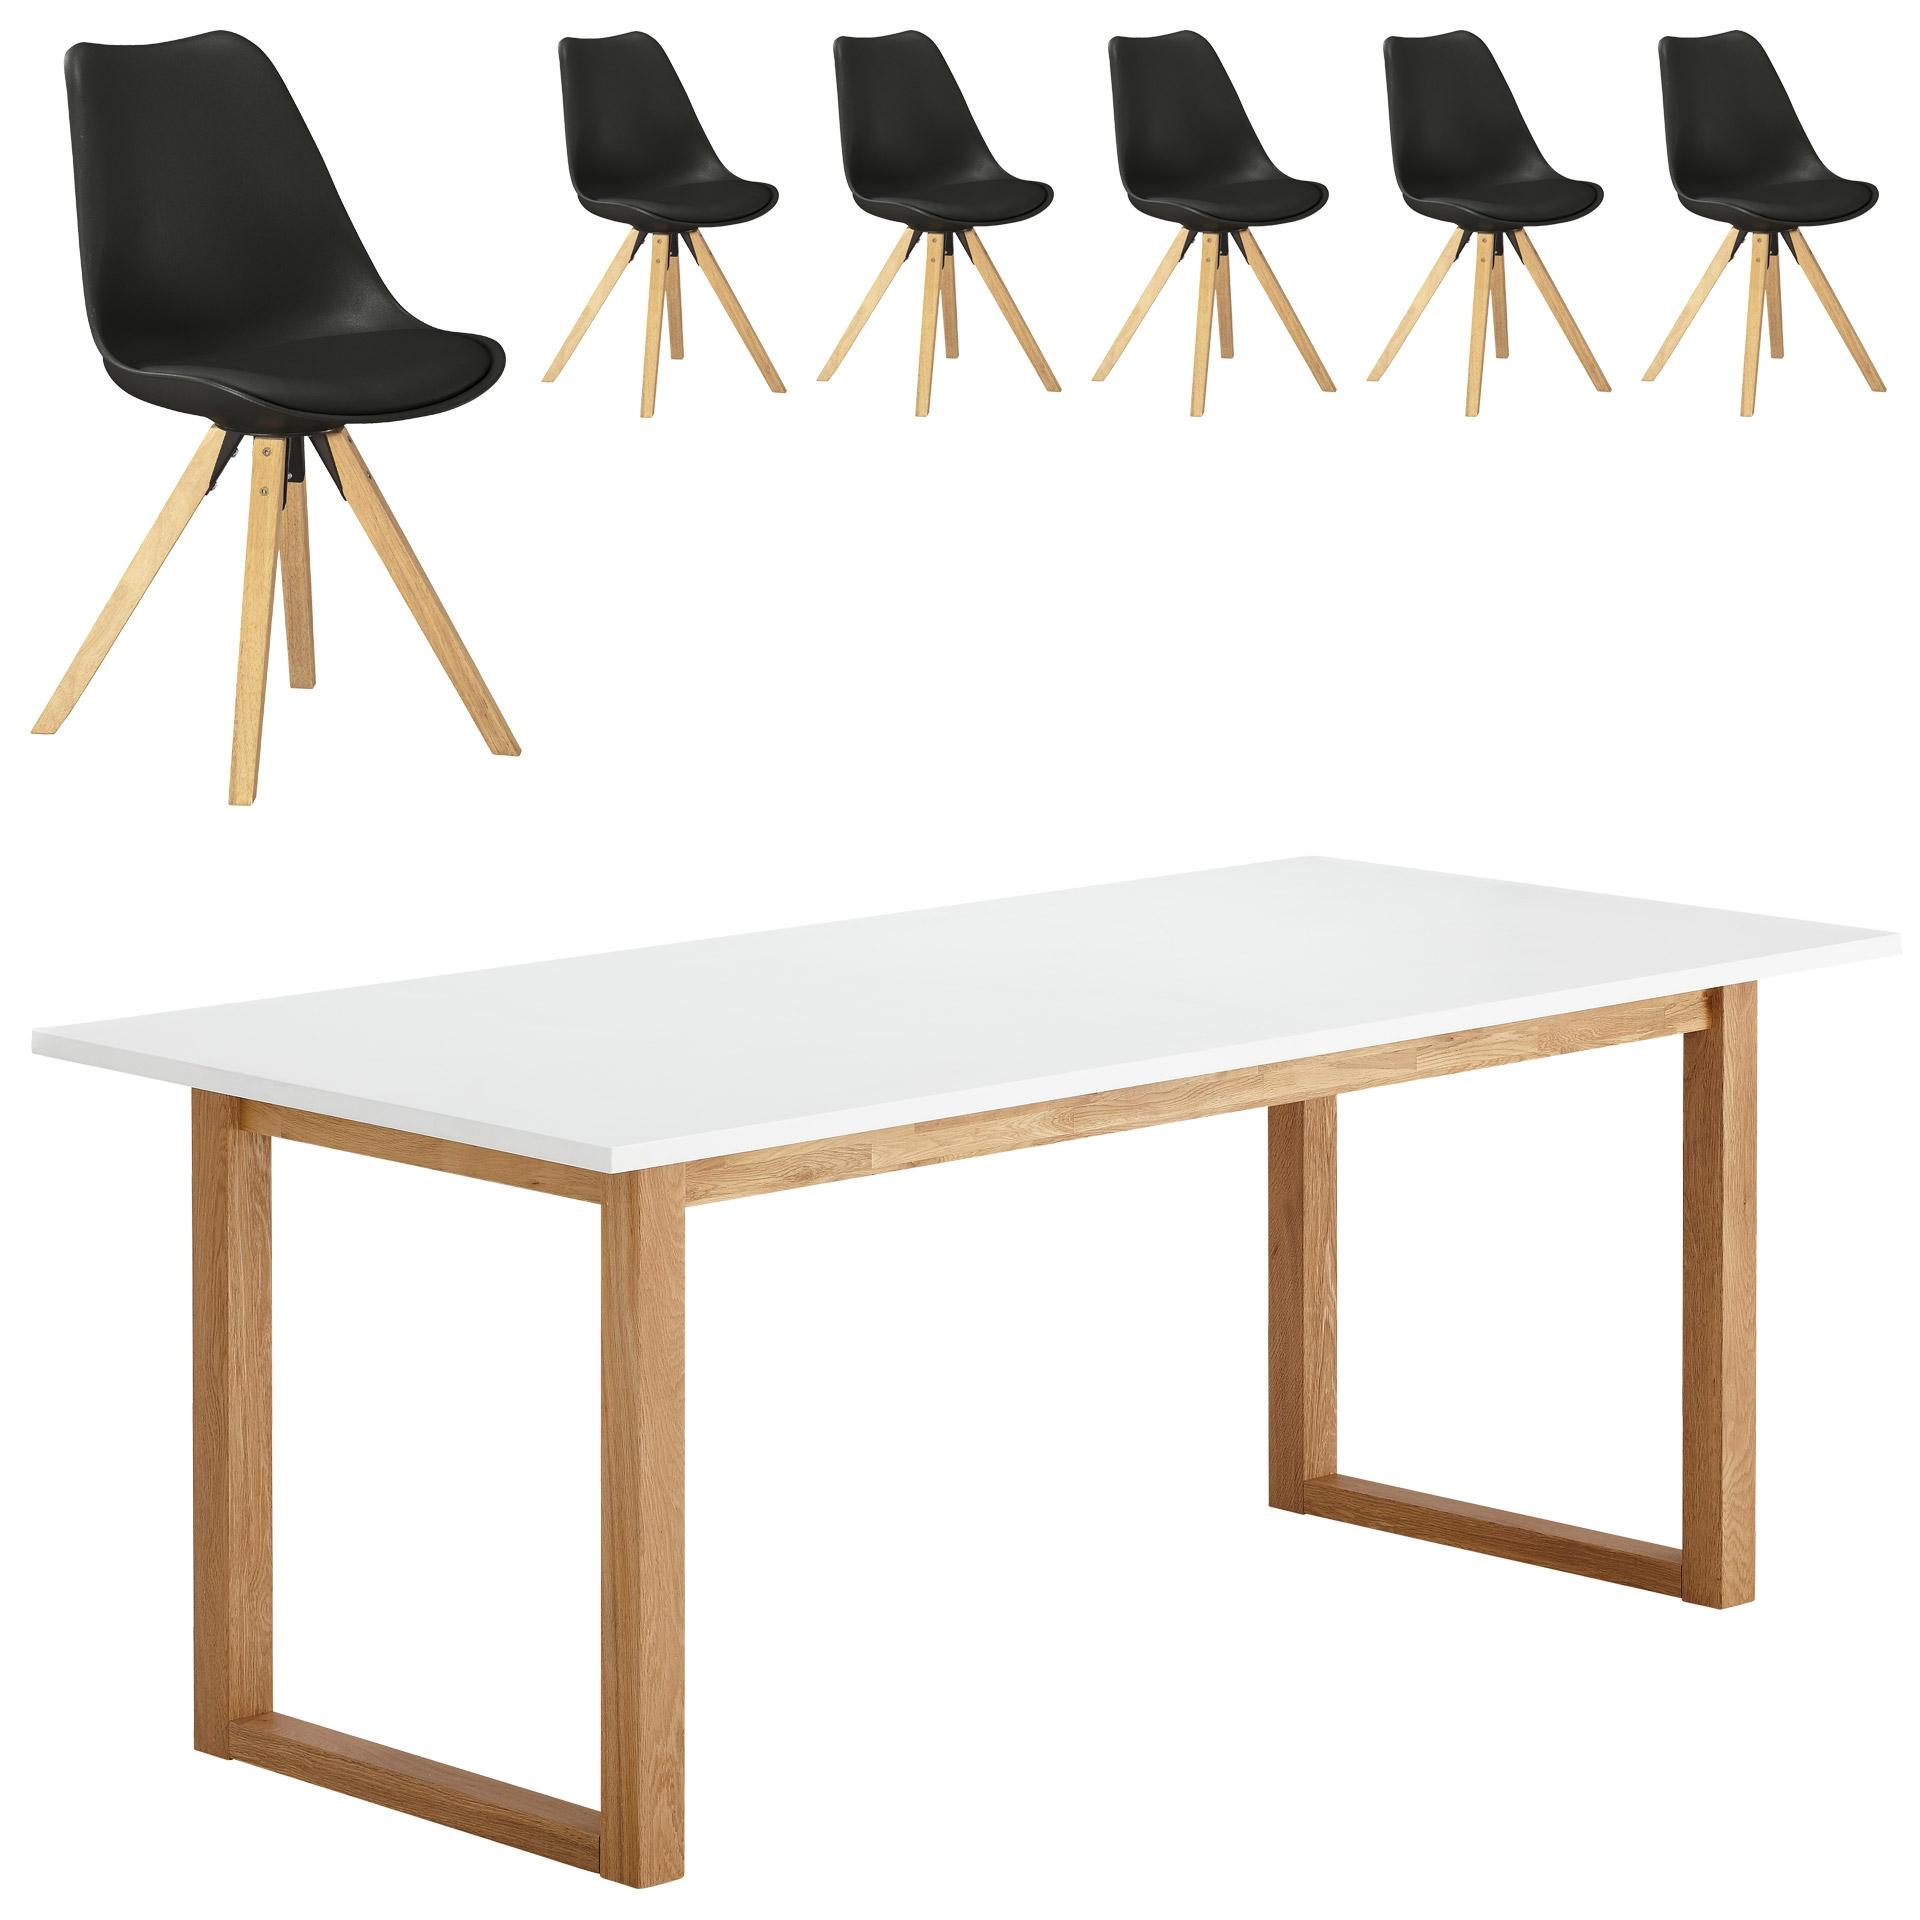 Essgruppe Hanstholm/ Blokhus (90x190, 6 Stühle, schwarz)